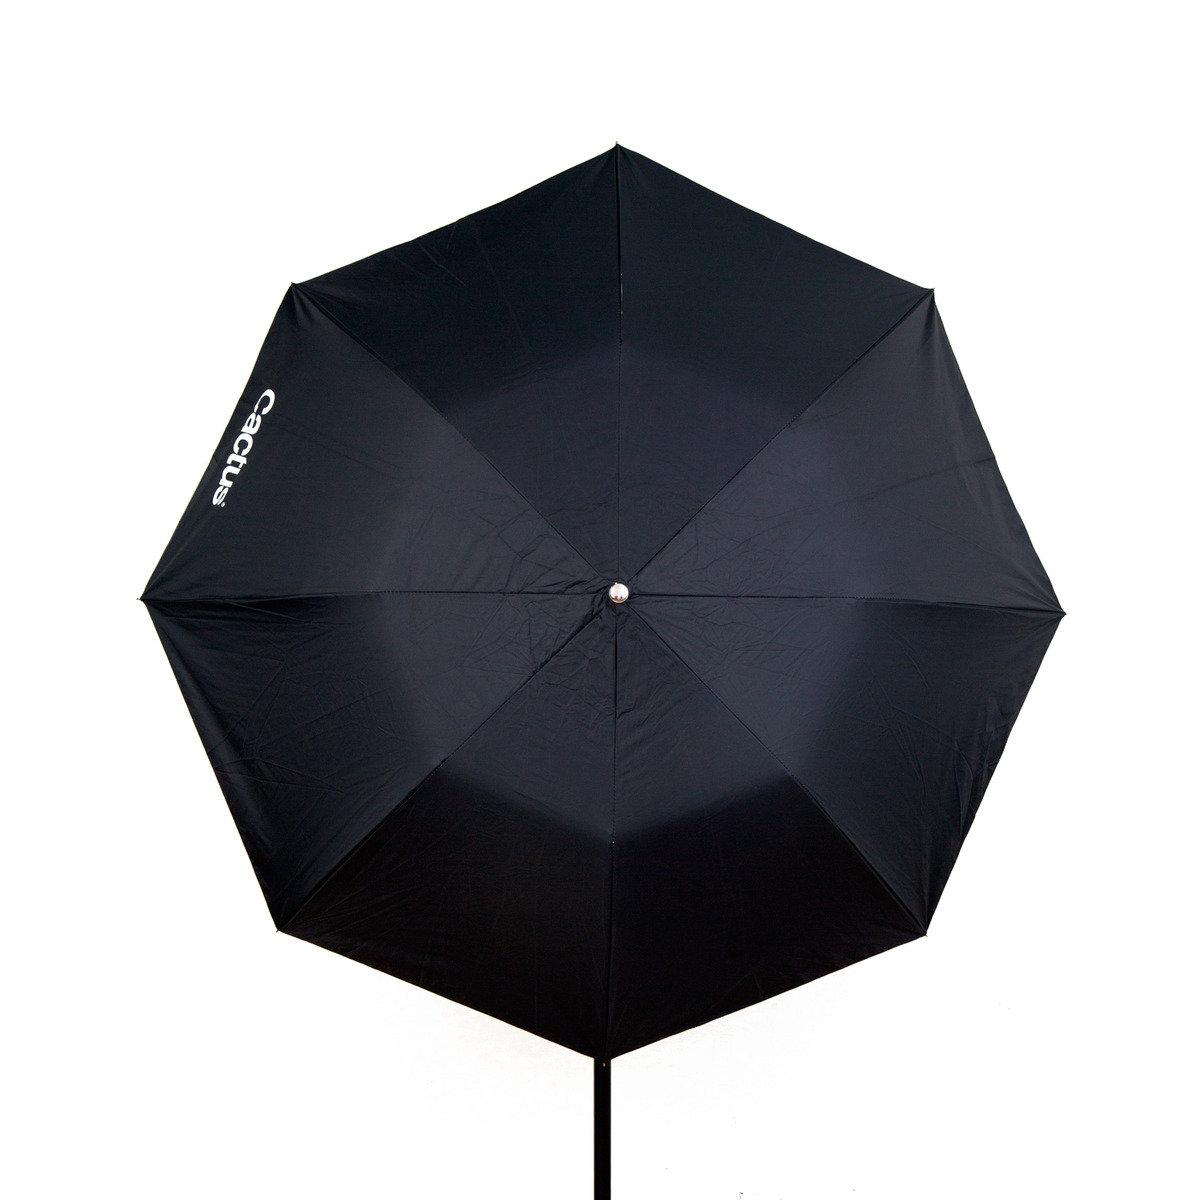 C-453 45吋黑色/白色折疊式柔光傘